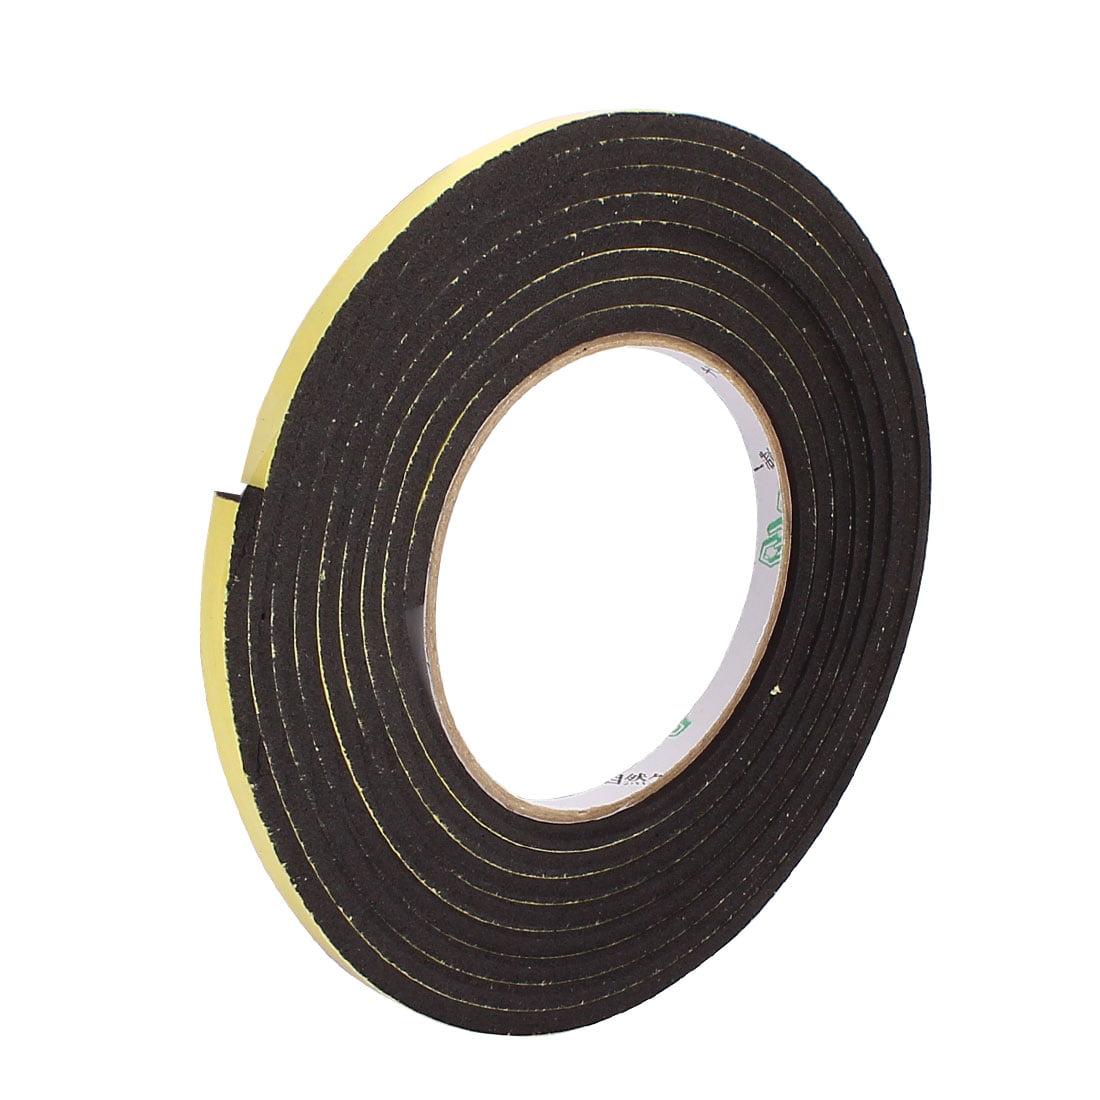 0.6CM Wide 3Meters Length 4MM Thick Single Sided Sealing Shockproof Sponge Tape